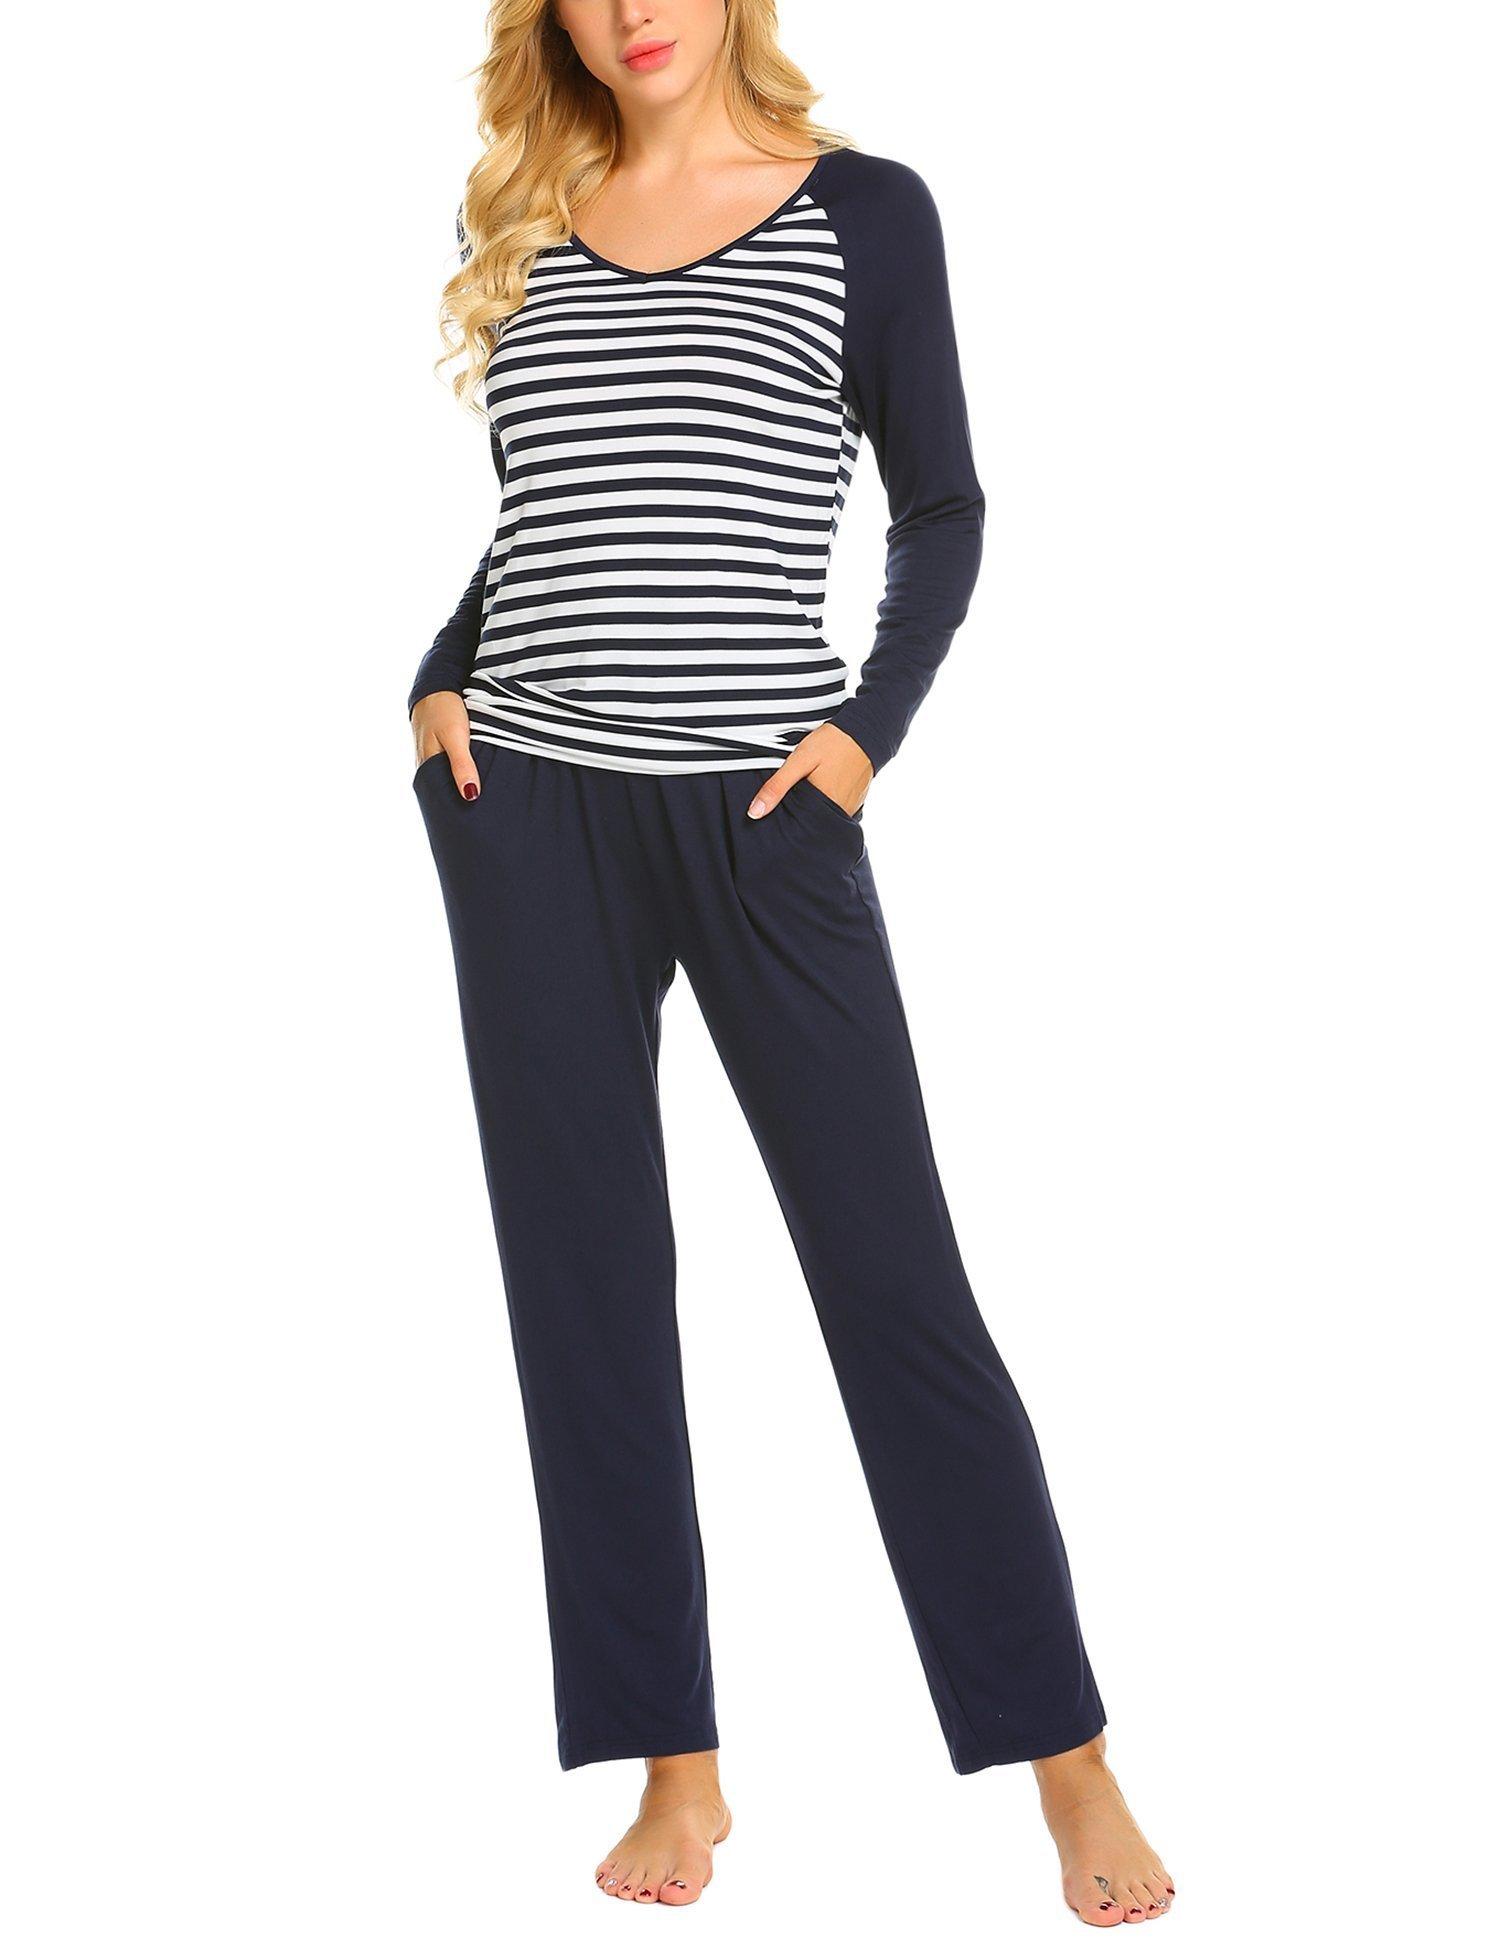 Ekouaer Women's V Neck Sleepwear Long Sleeve Tops with Pants Pajama Set (Navy Blue XXL)